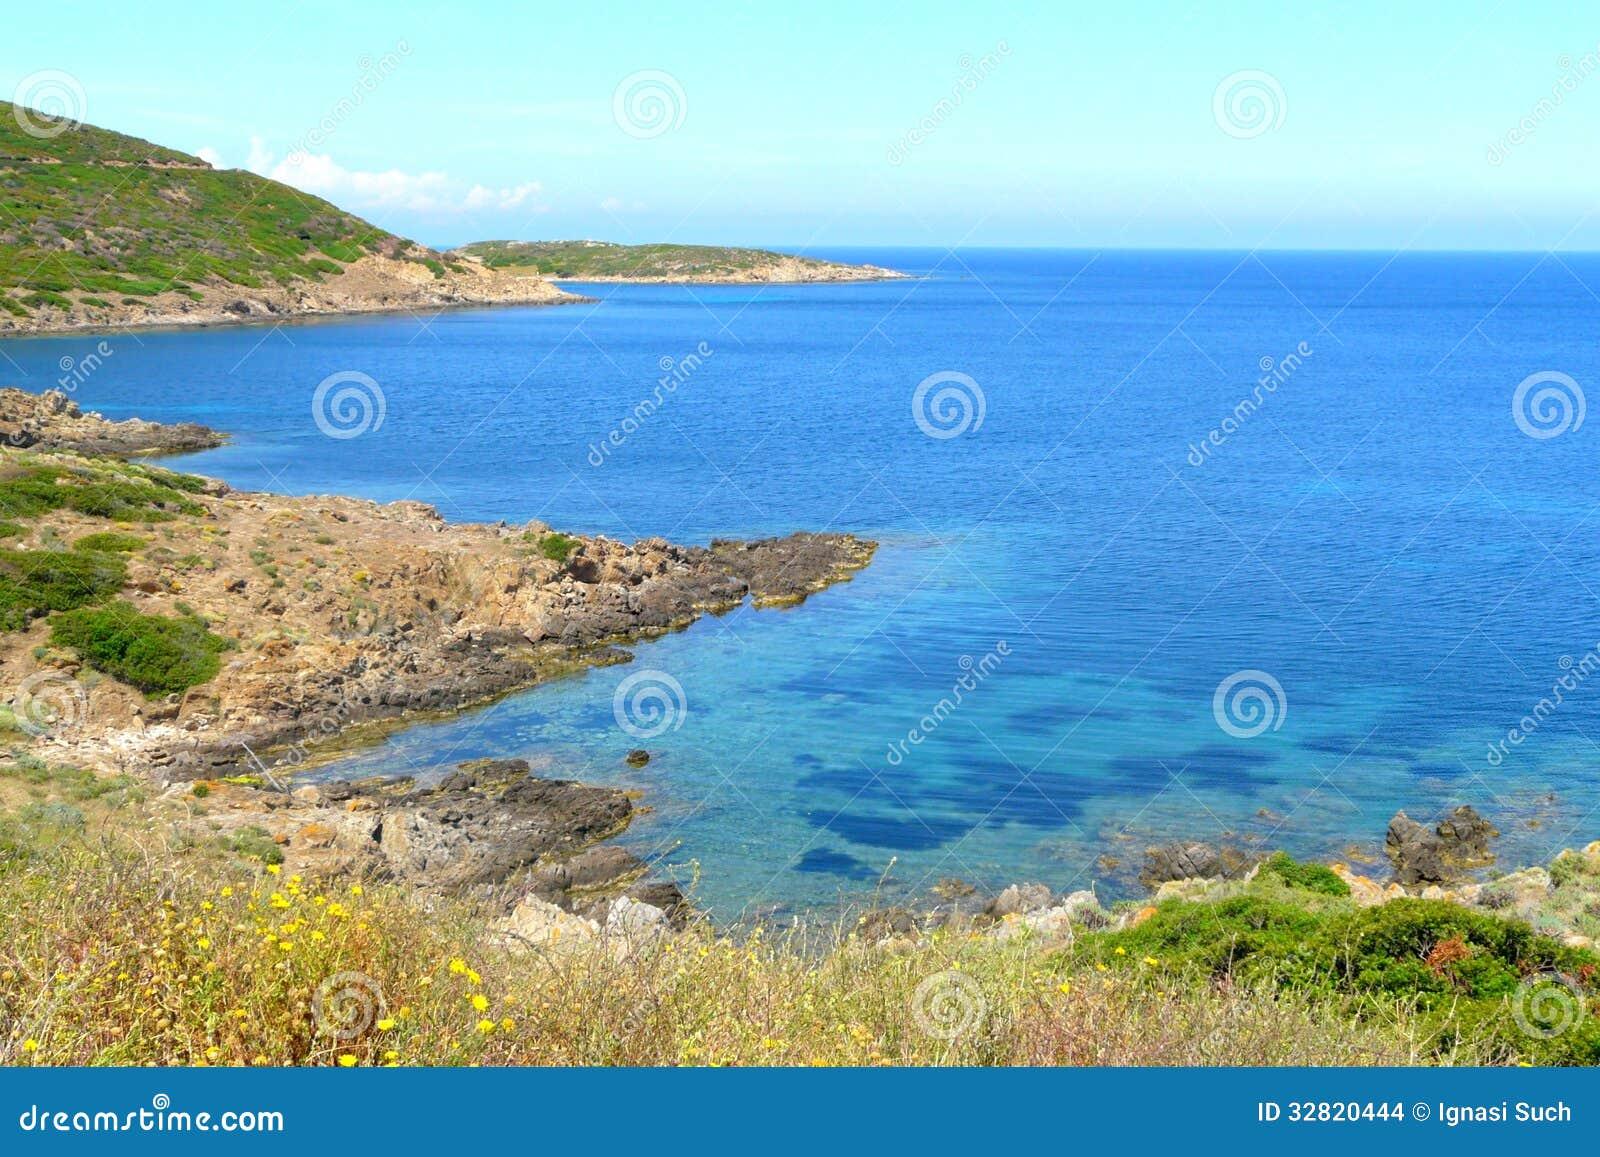 Asinara Island National Park